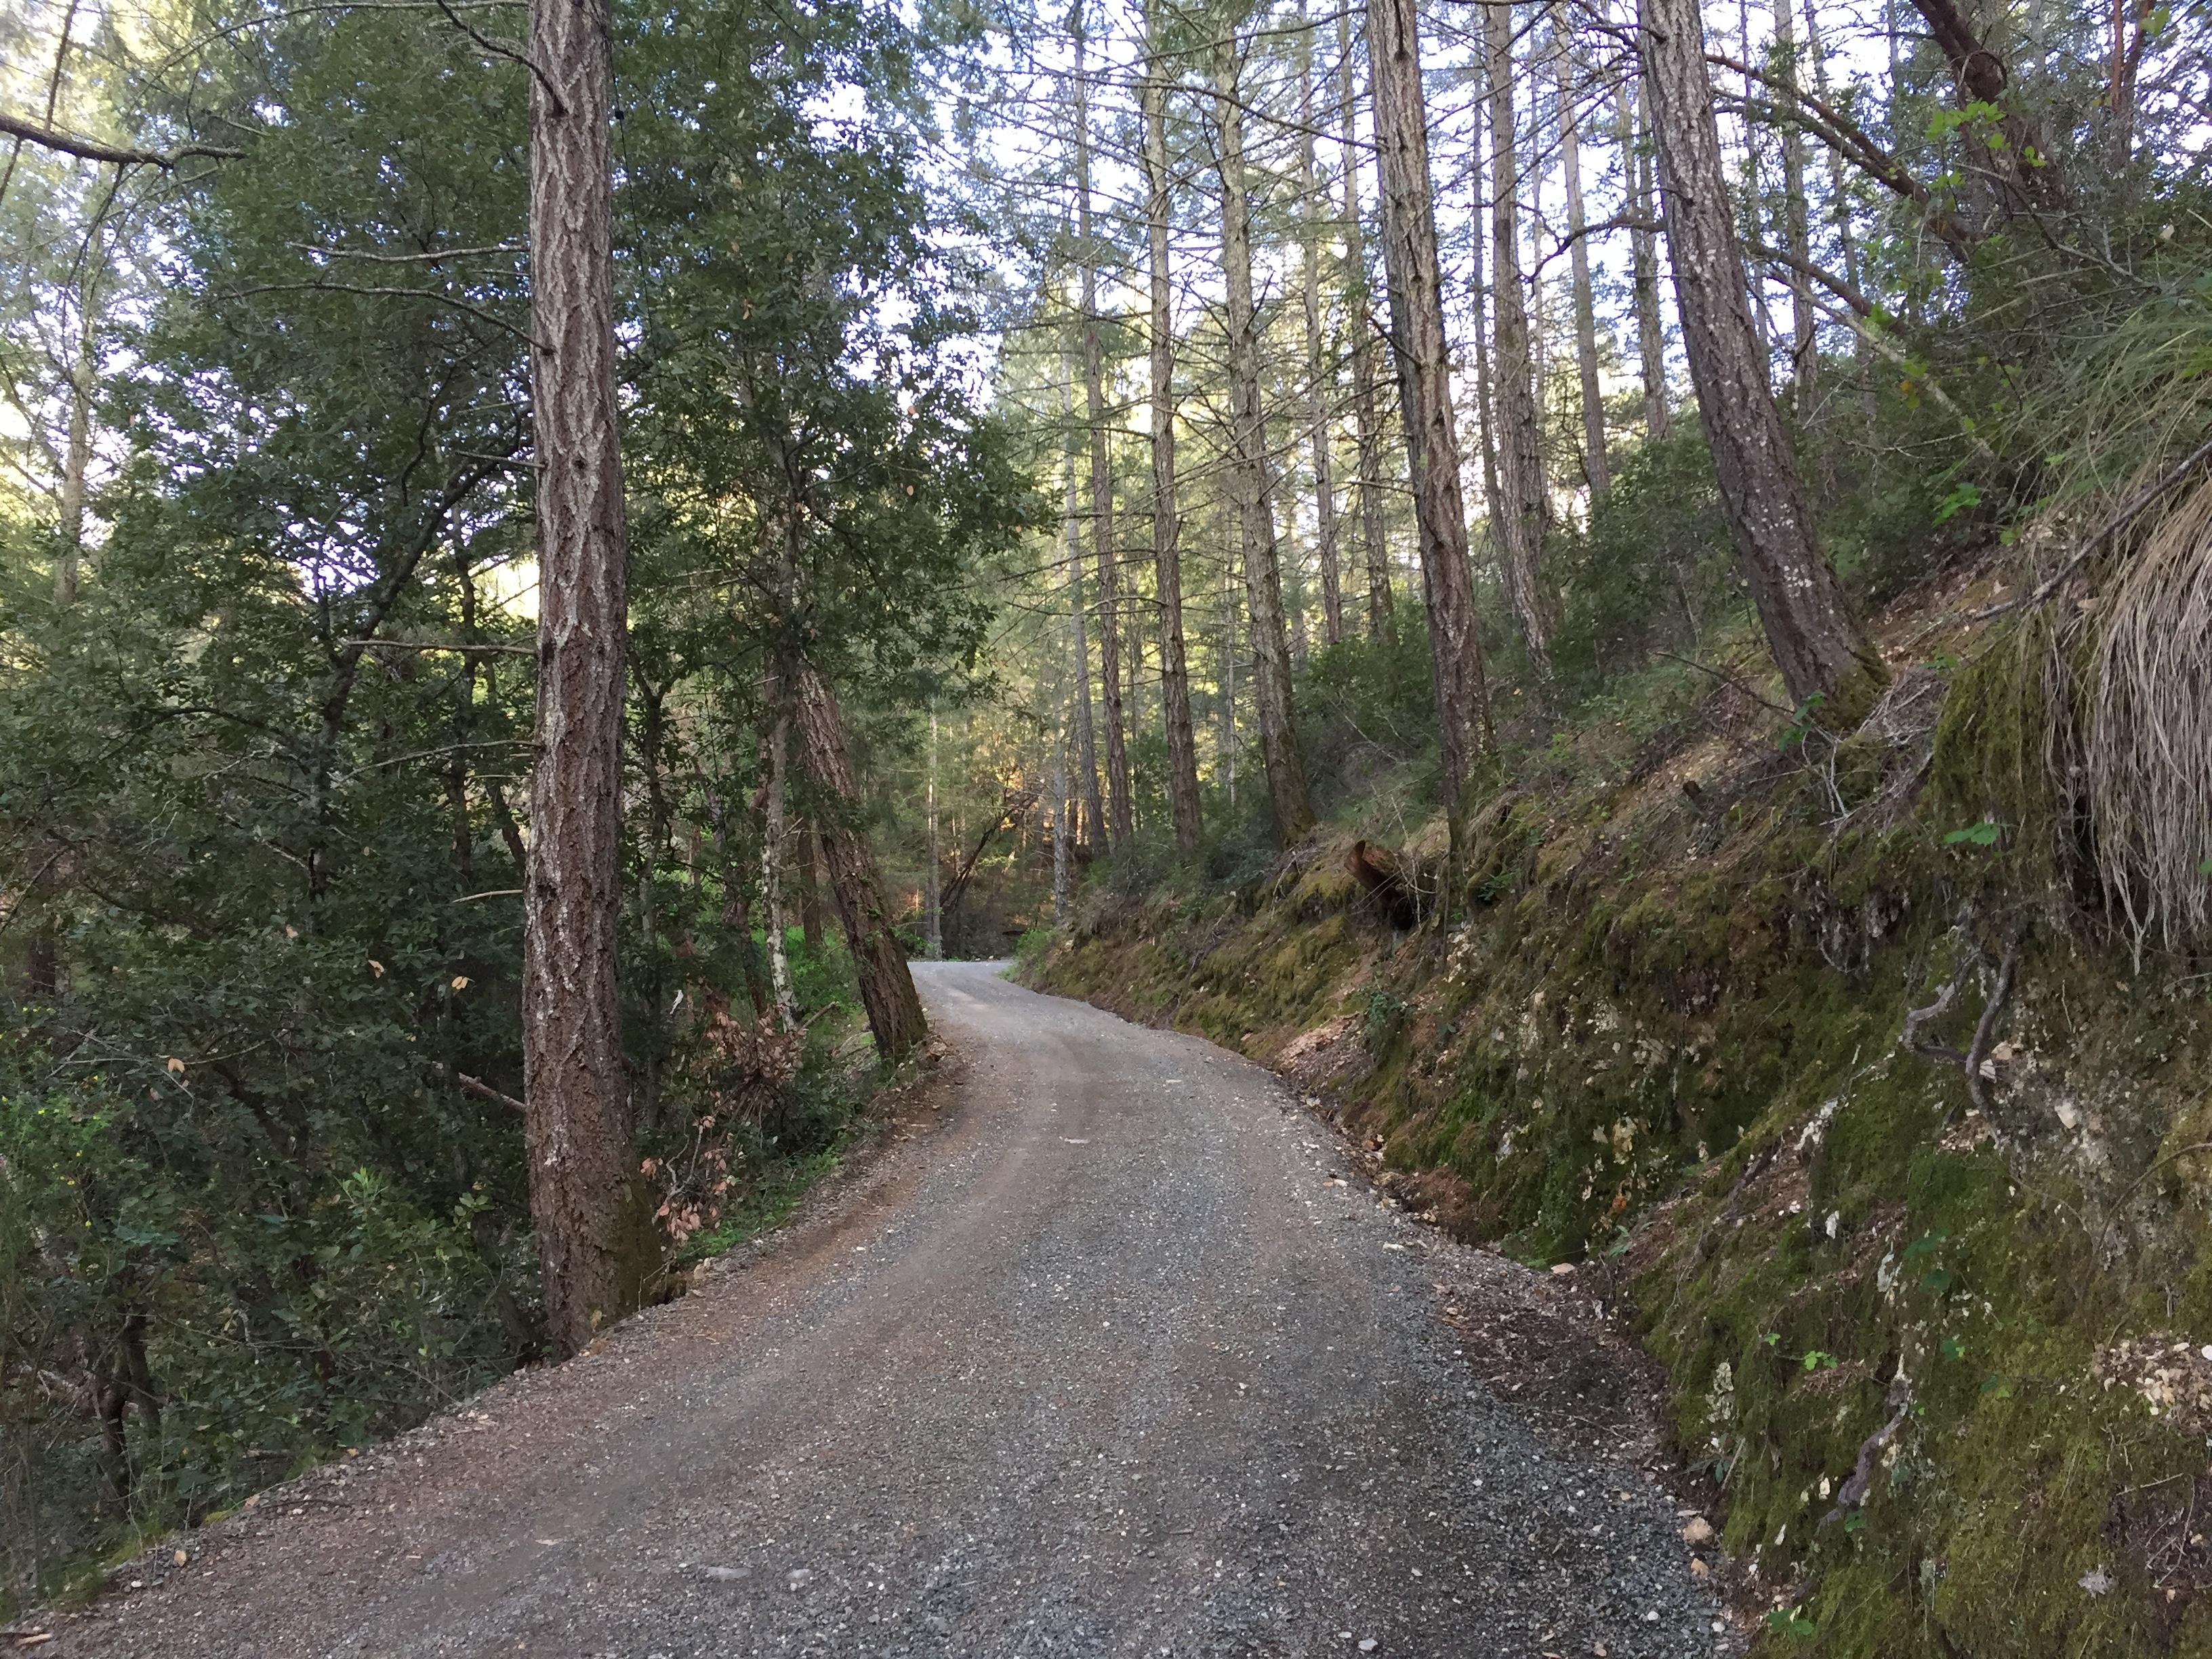 diamond mountain road forest